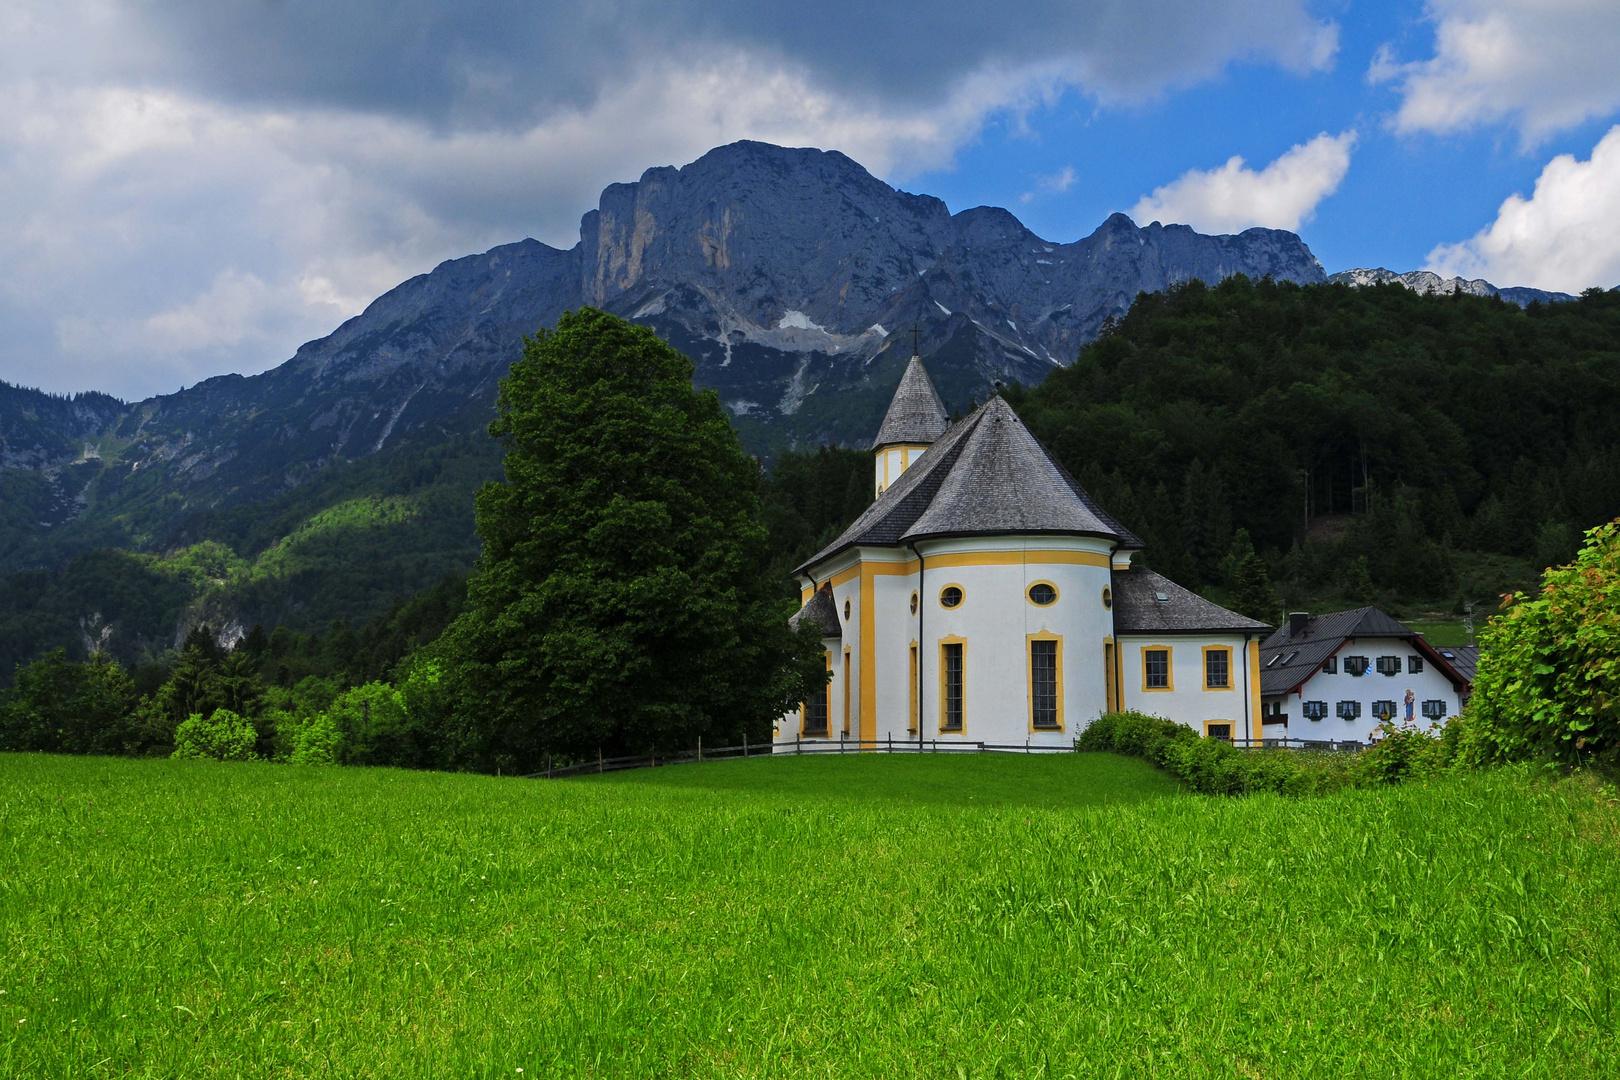 Wallfahrtskirche - Maria Heimsuchung - Ettenberg im Berchtesgadener Land